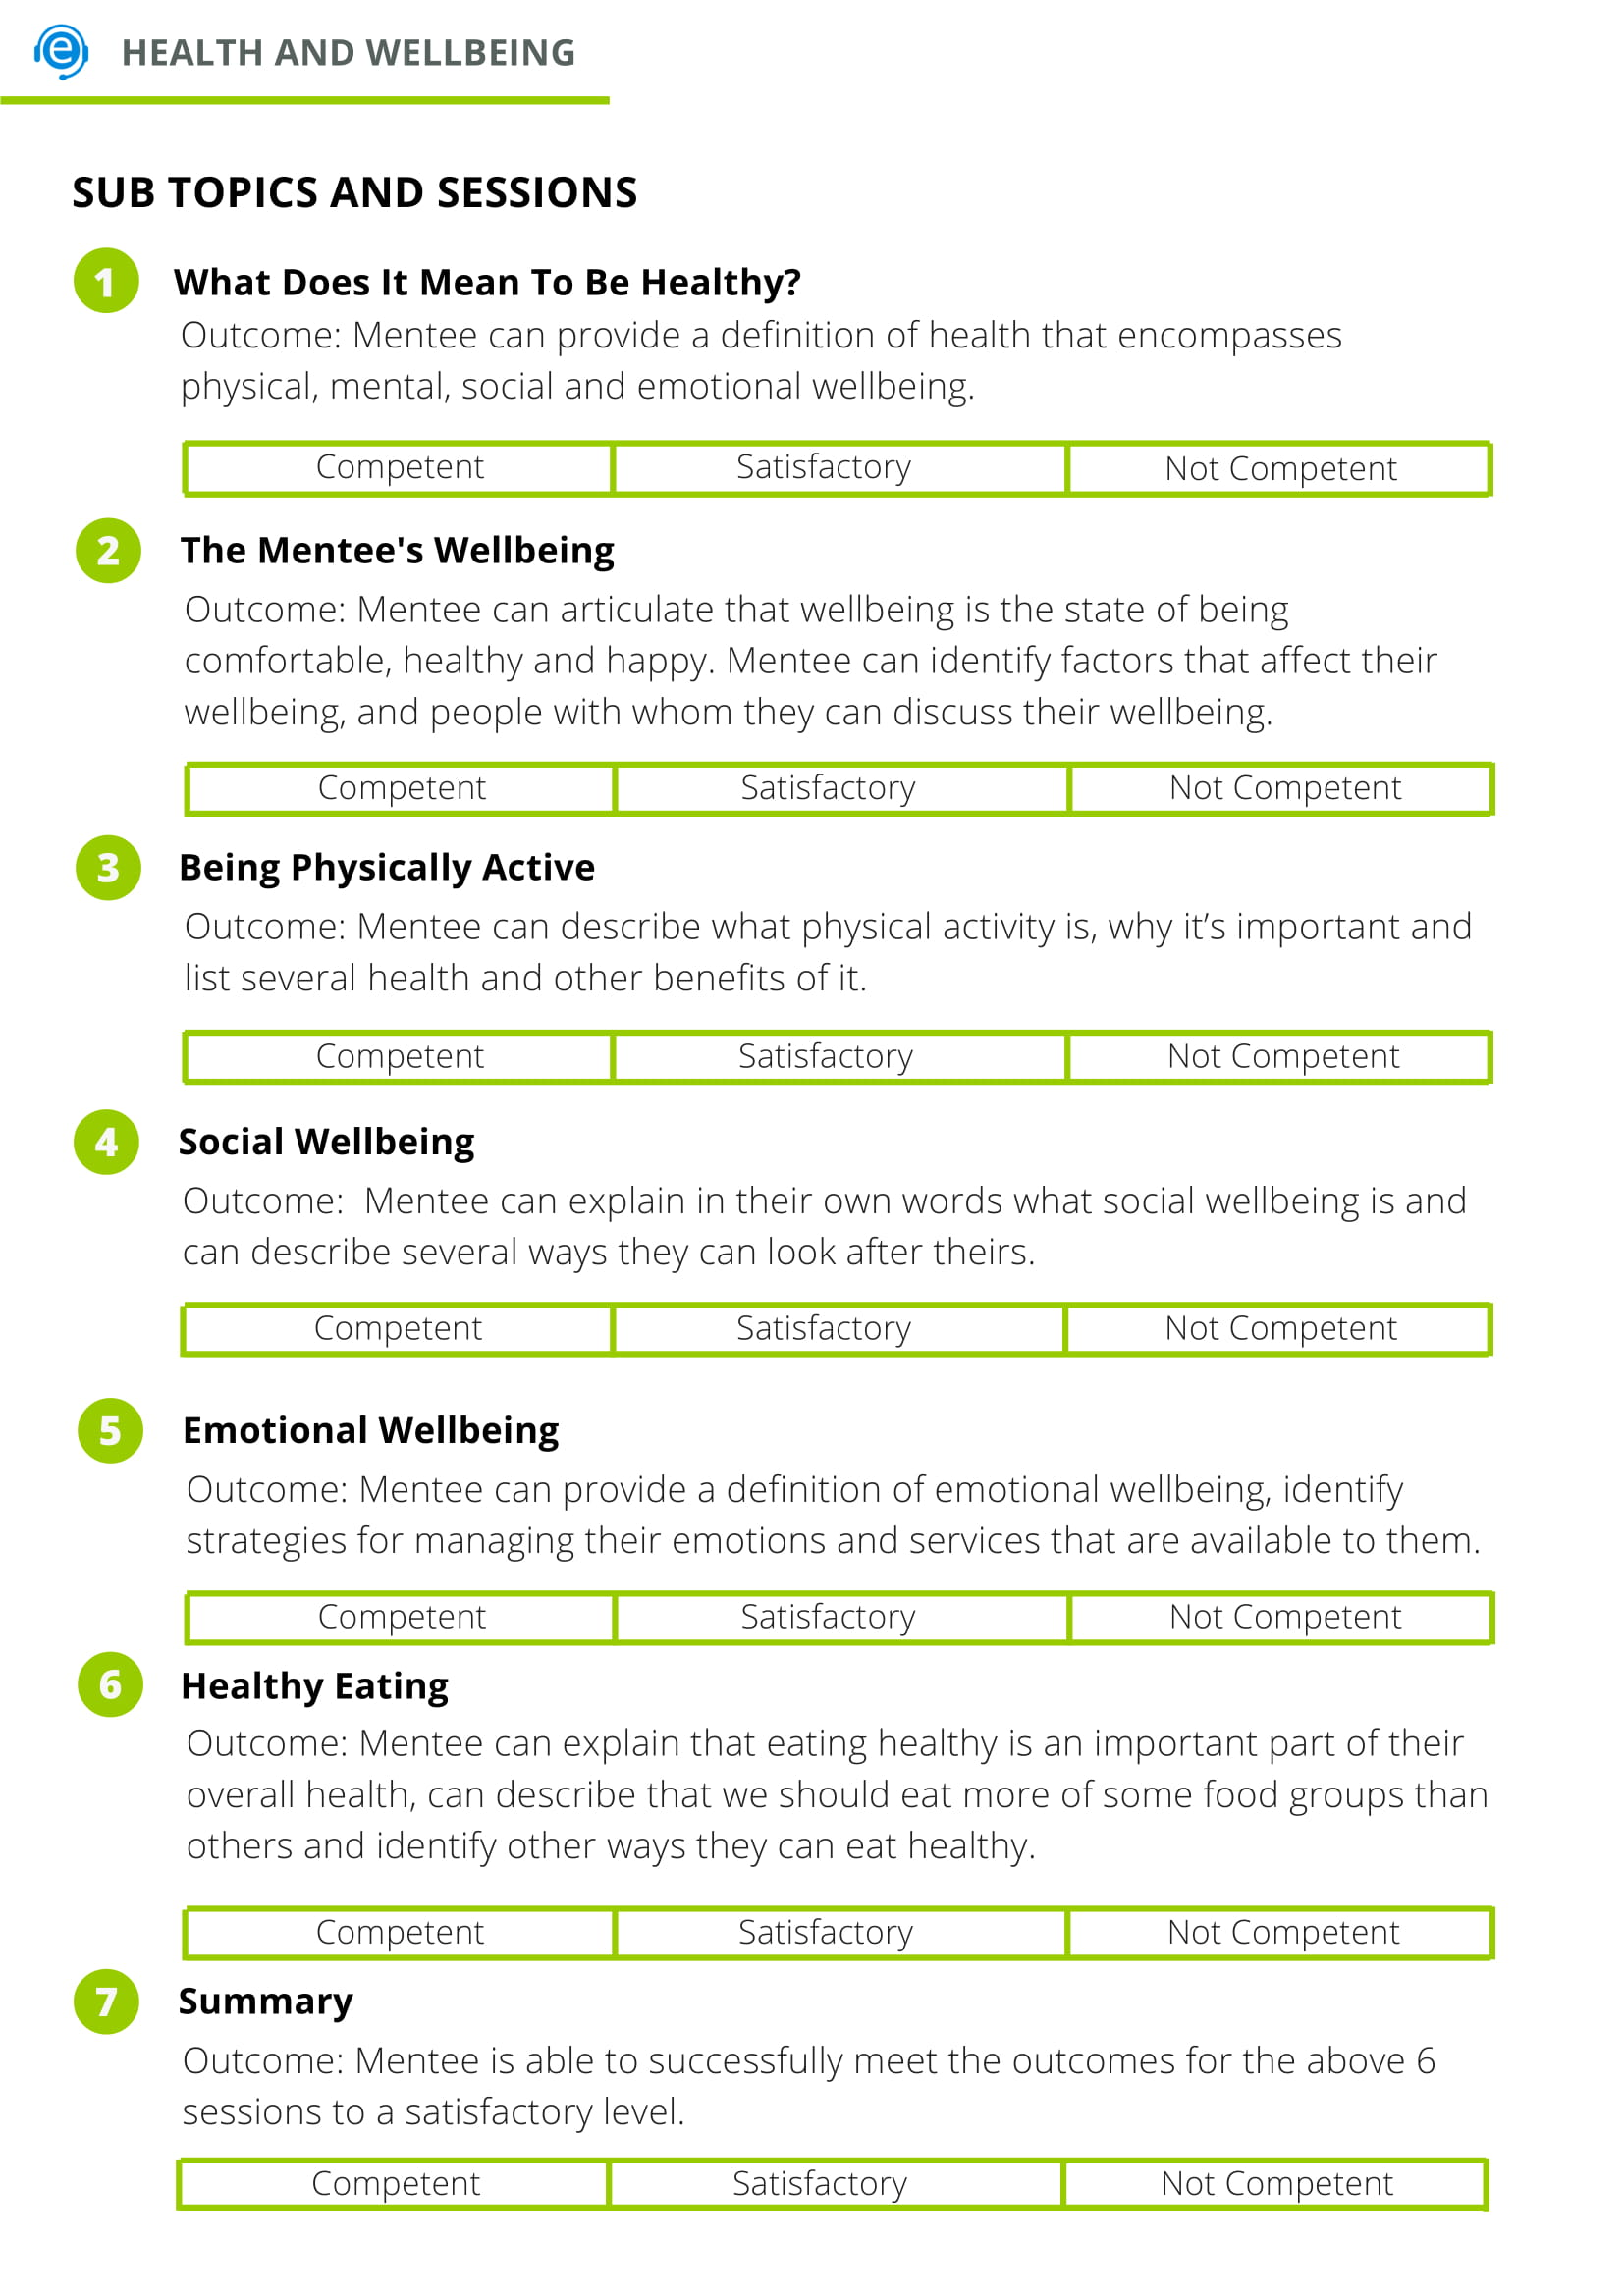 Health and Wellbeing-03.jpg